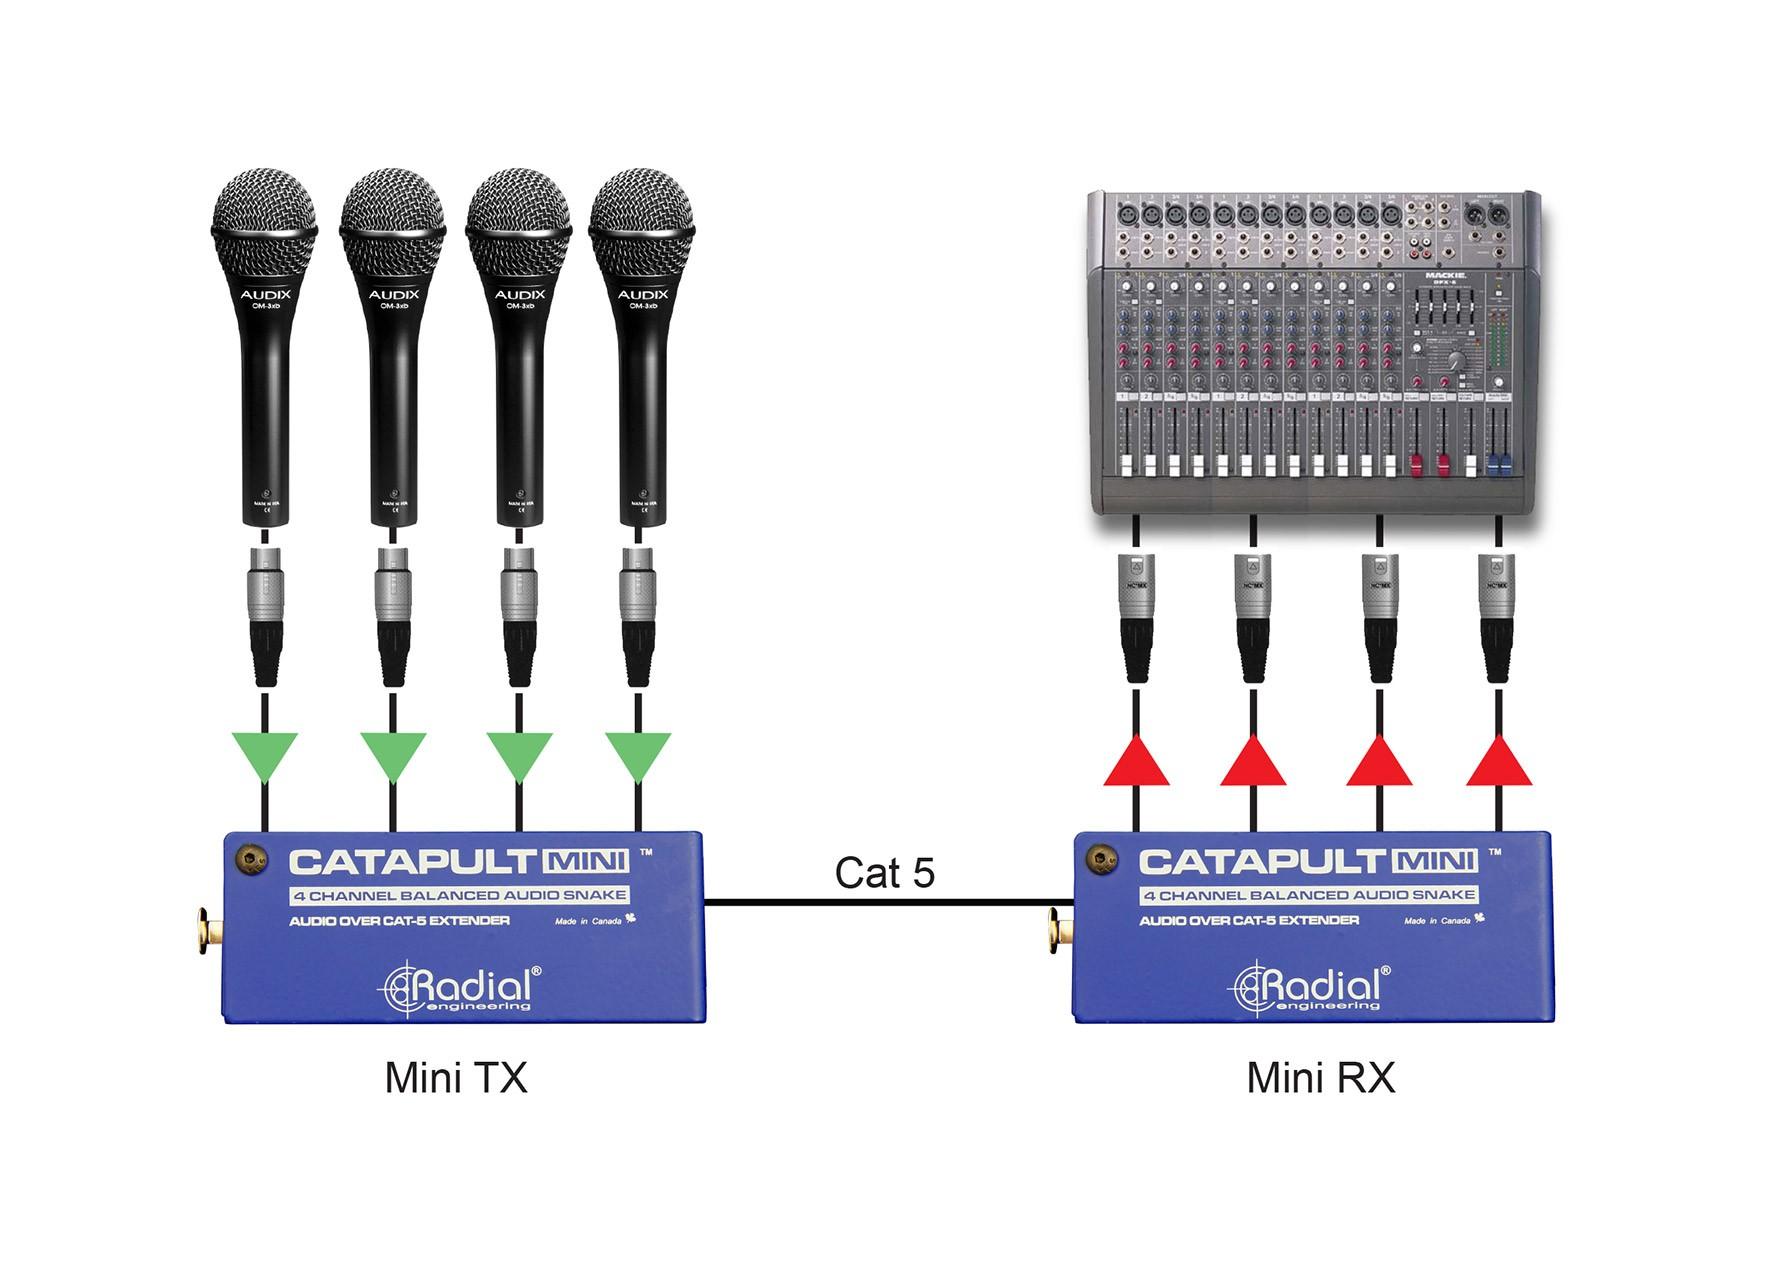 Radial-catapult-mini-app-rx-tx-1-15.jpg